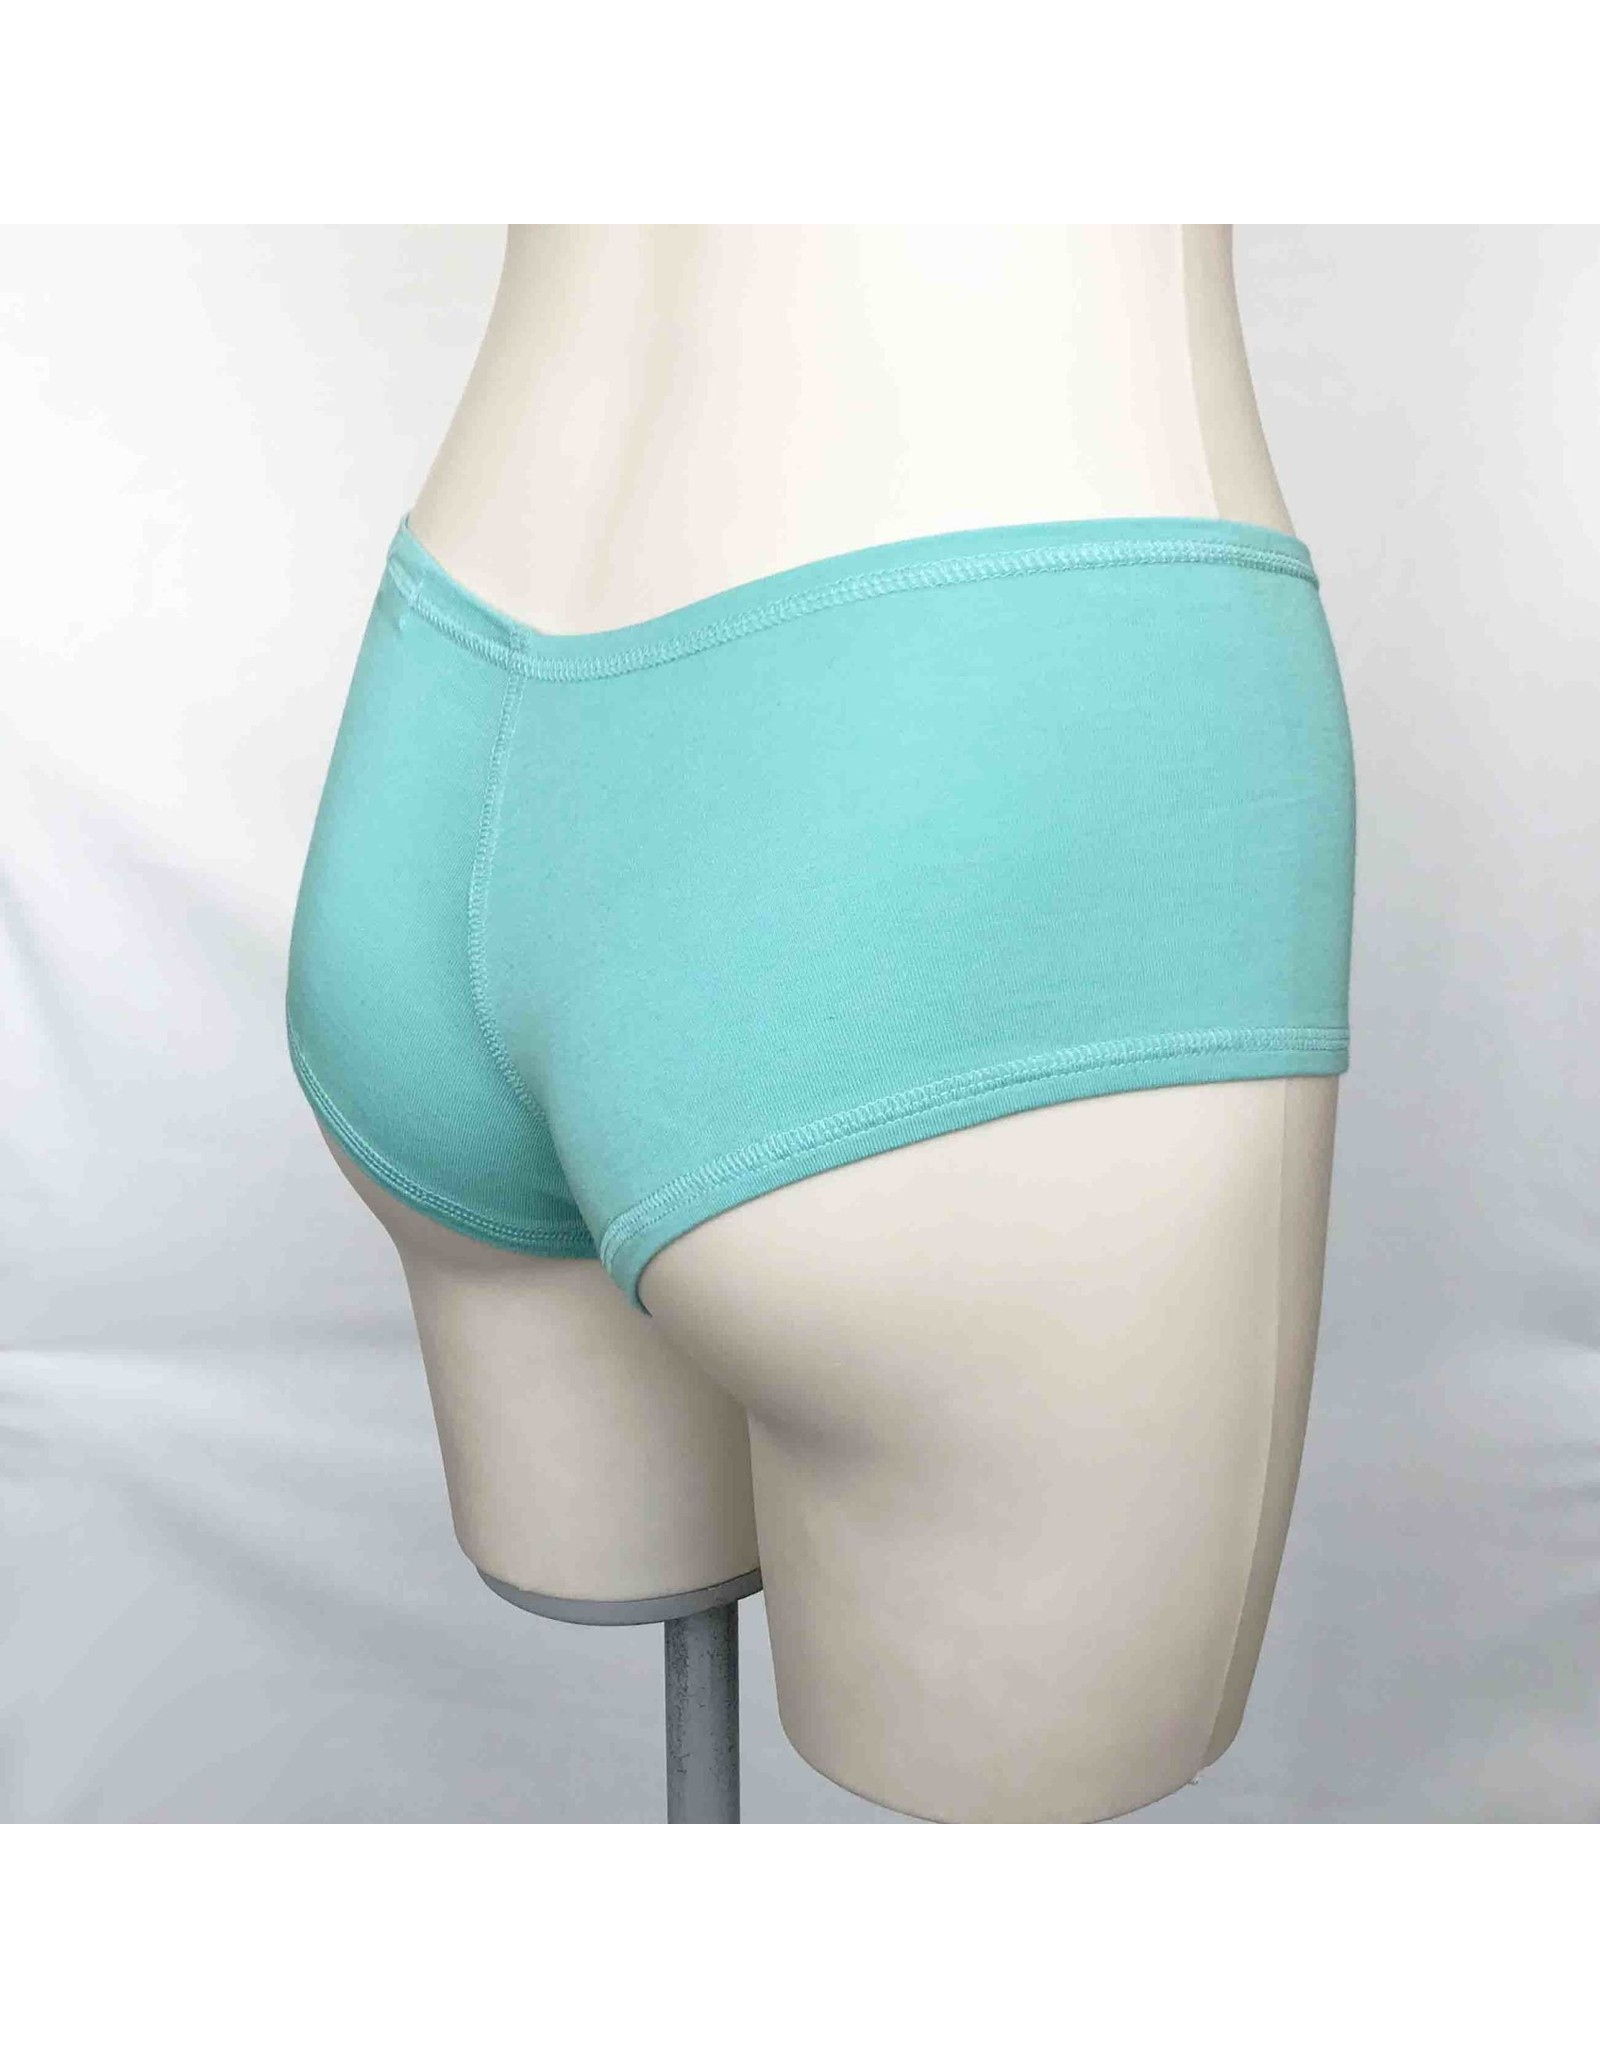 Devil May Wear Hot Shorts Bamboo Blend Underwear. Seafoam